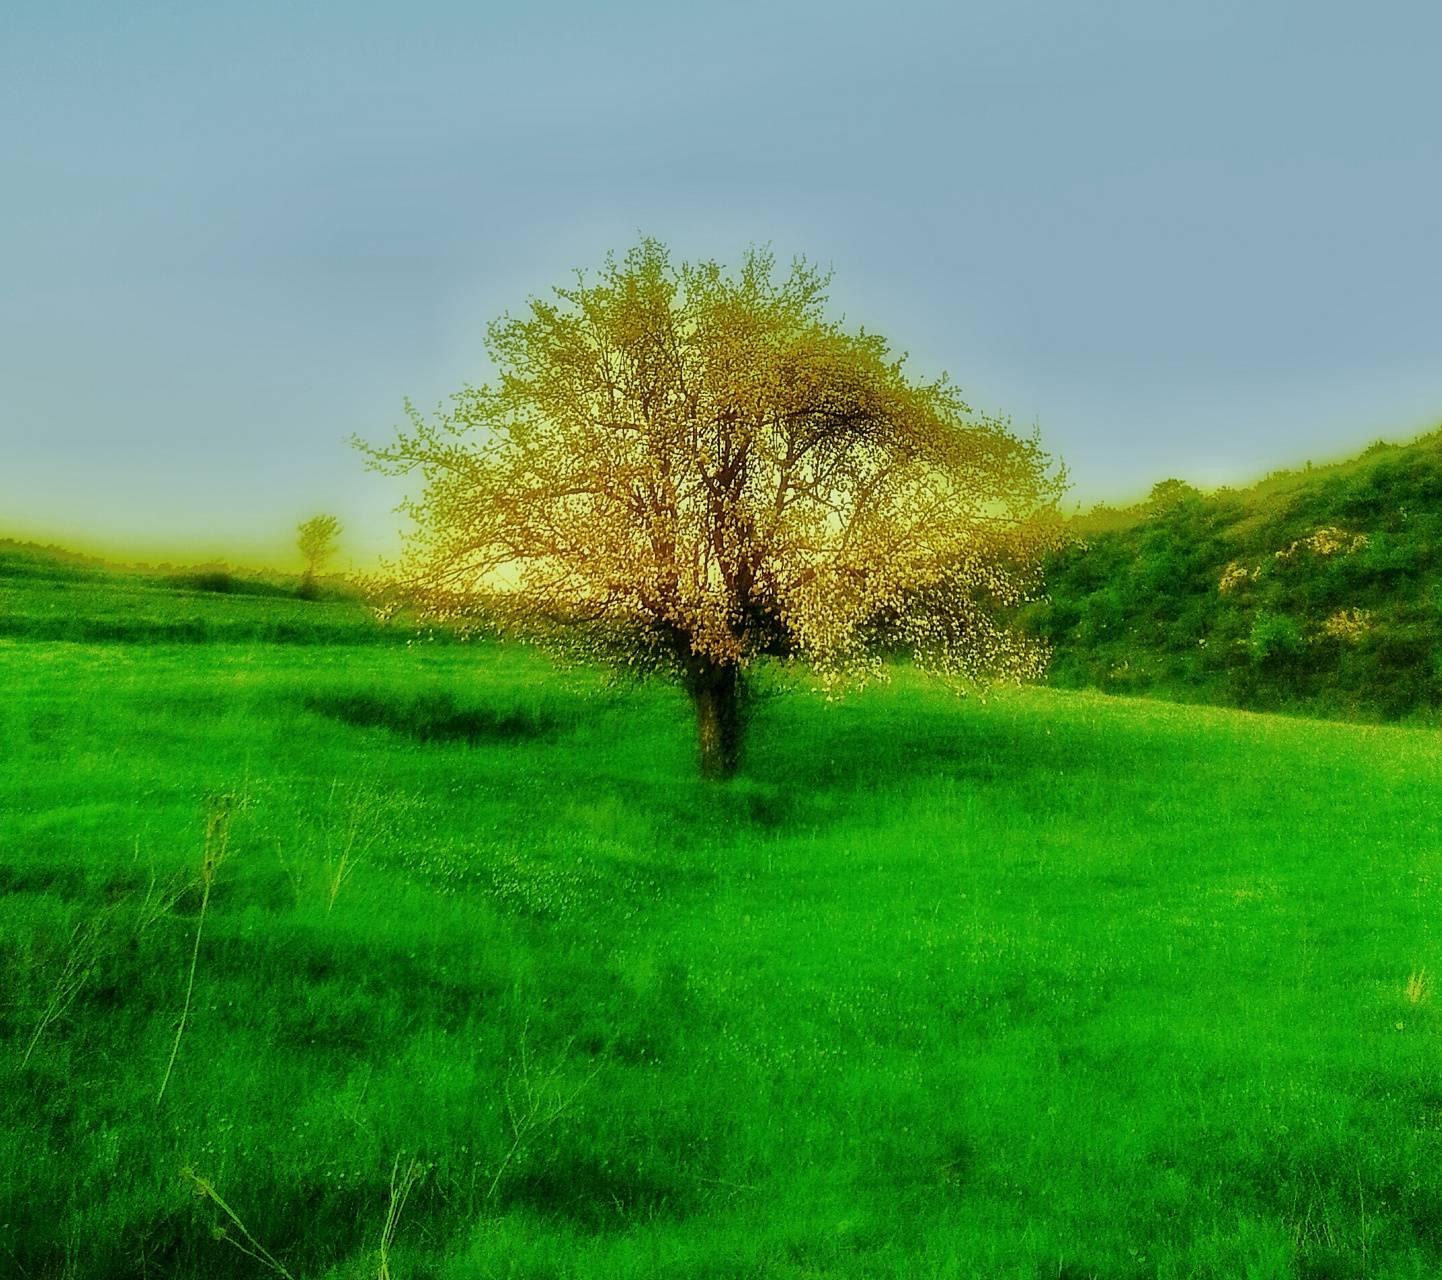 Lone golden tree